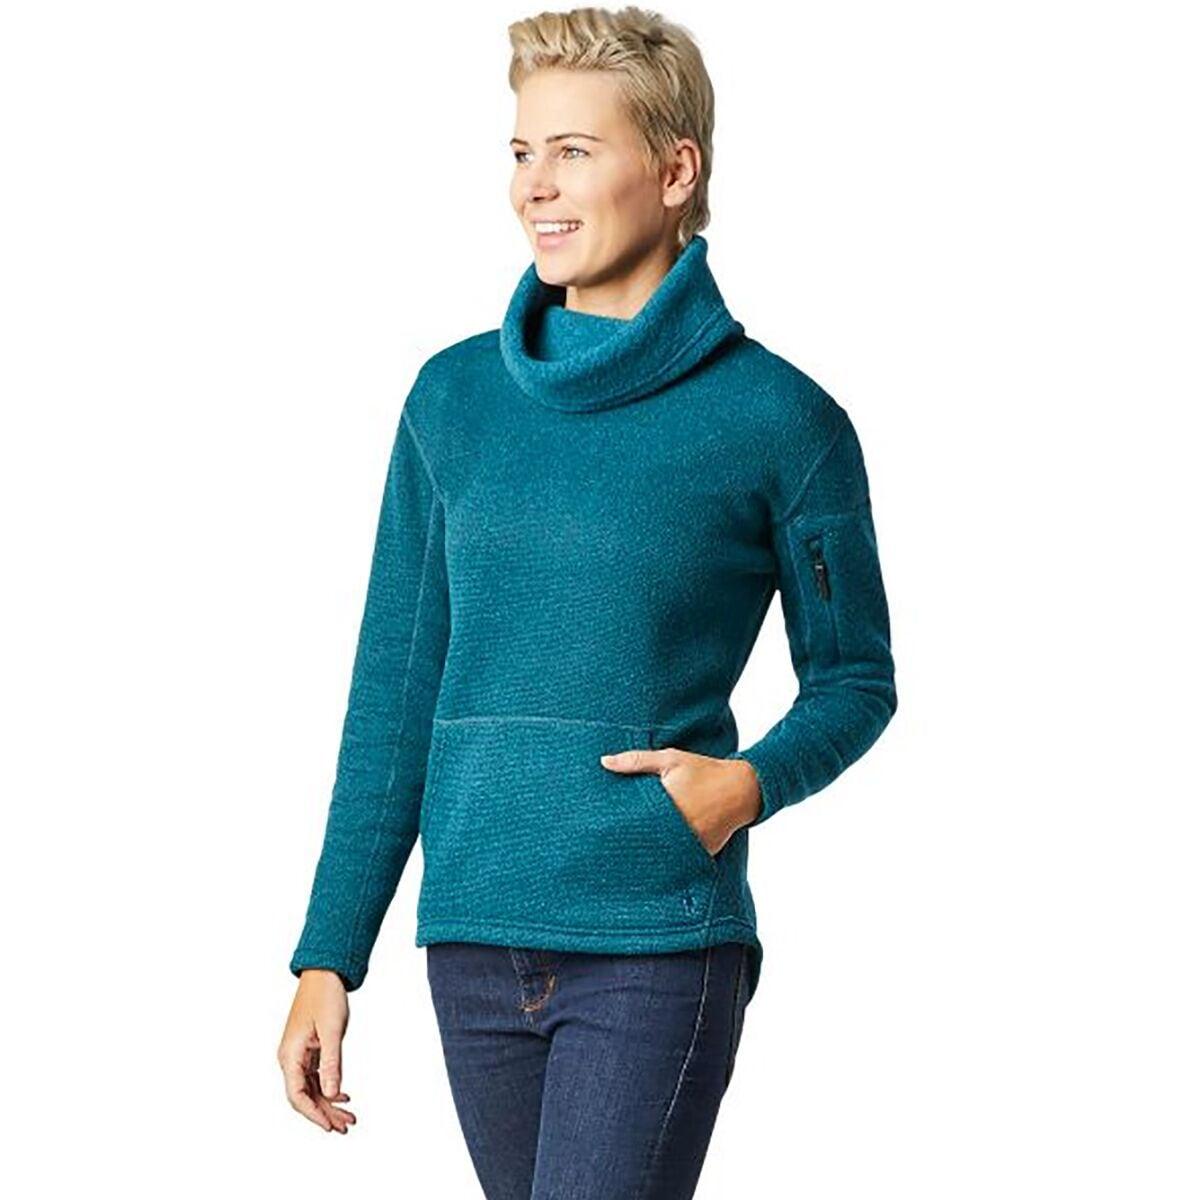 Hudson Trail Pullover Fleece Sweater - Women